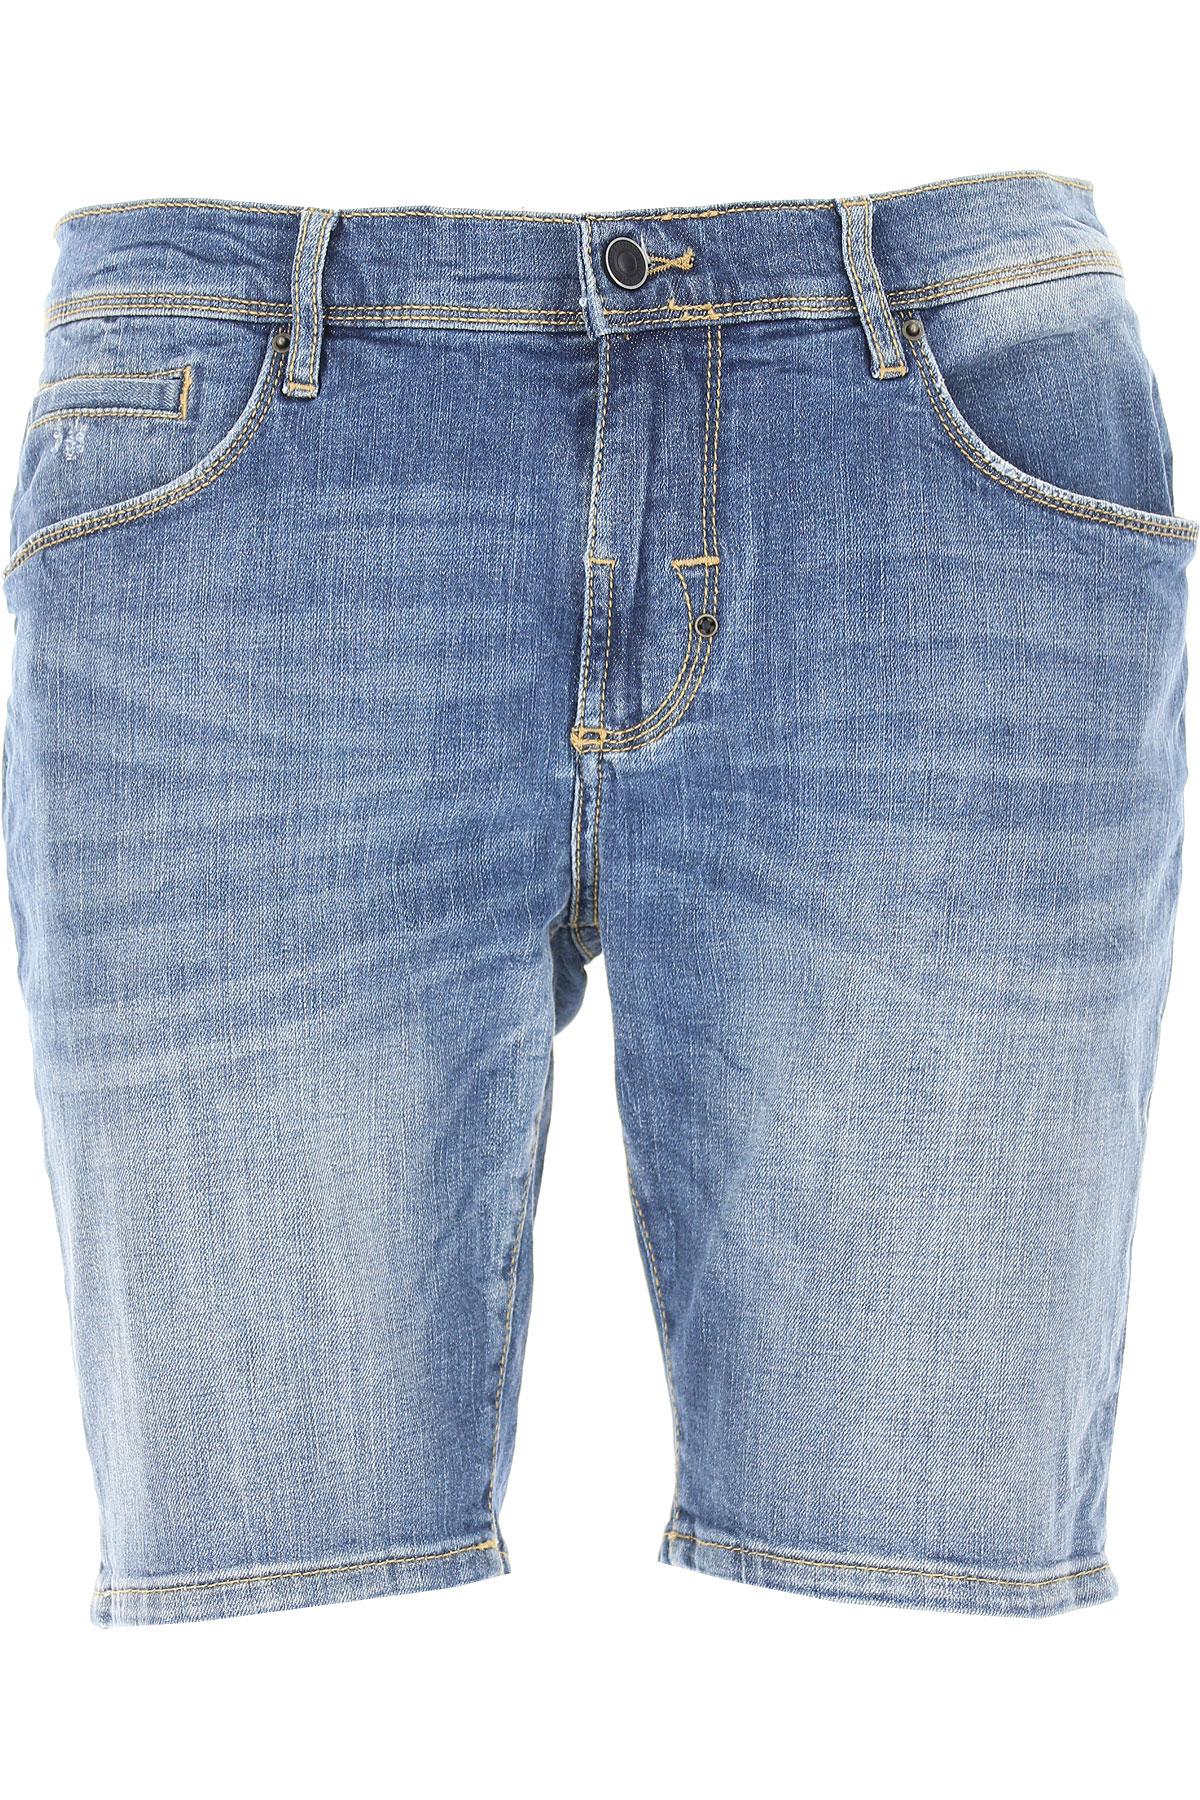 Antony Morato Shorts for Men On Sale, Denim Blue, Cotton, 2019, 32